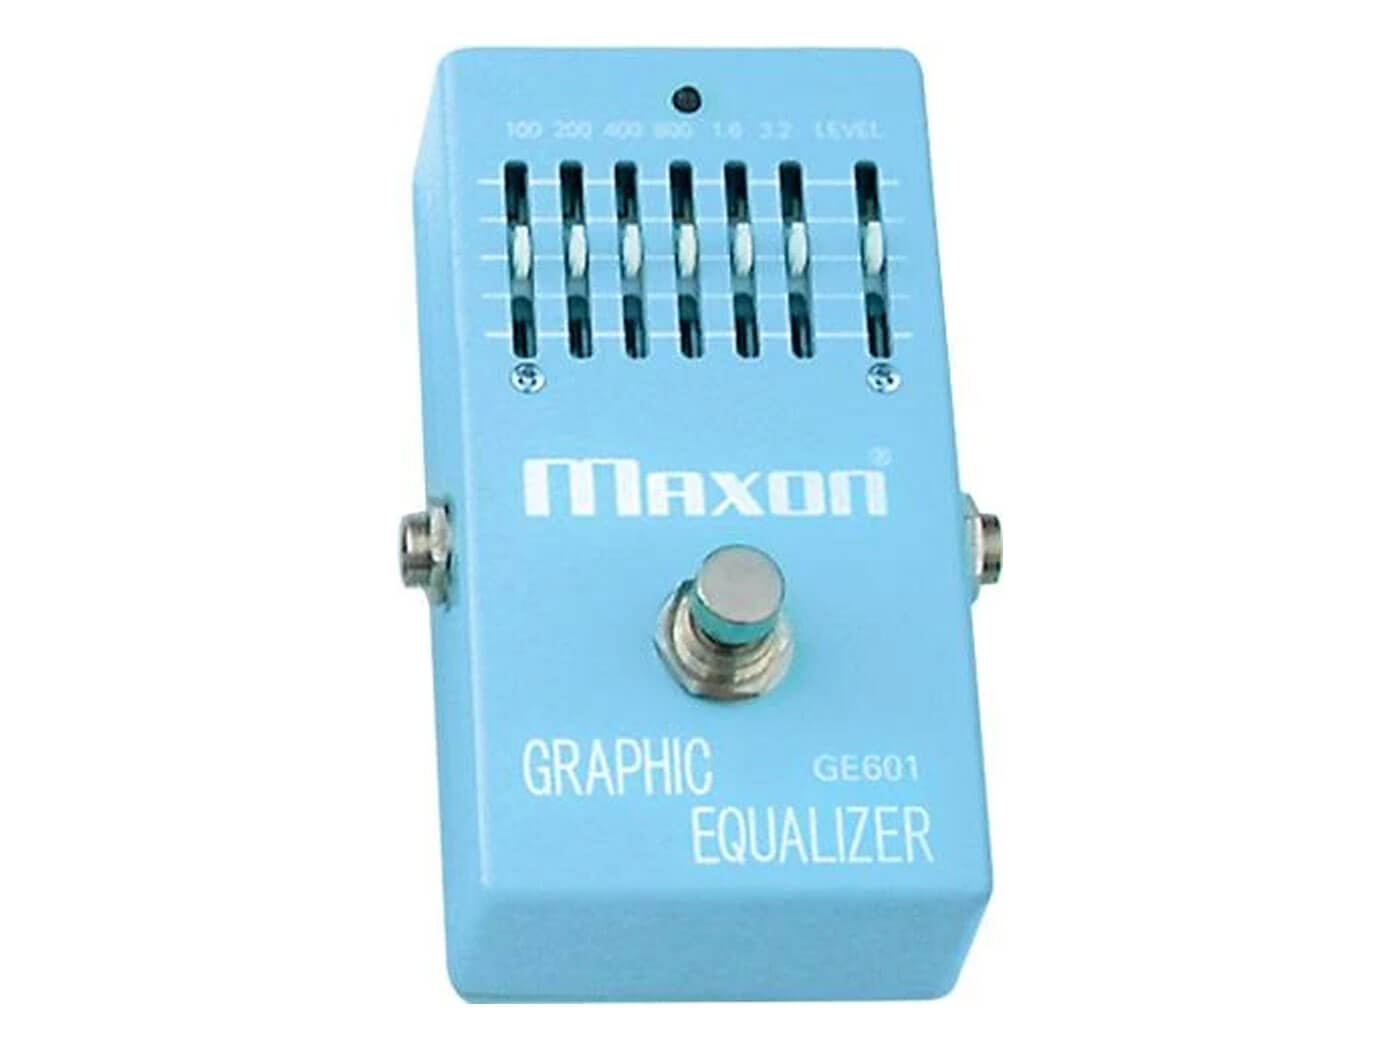 Maxon GE601